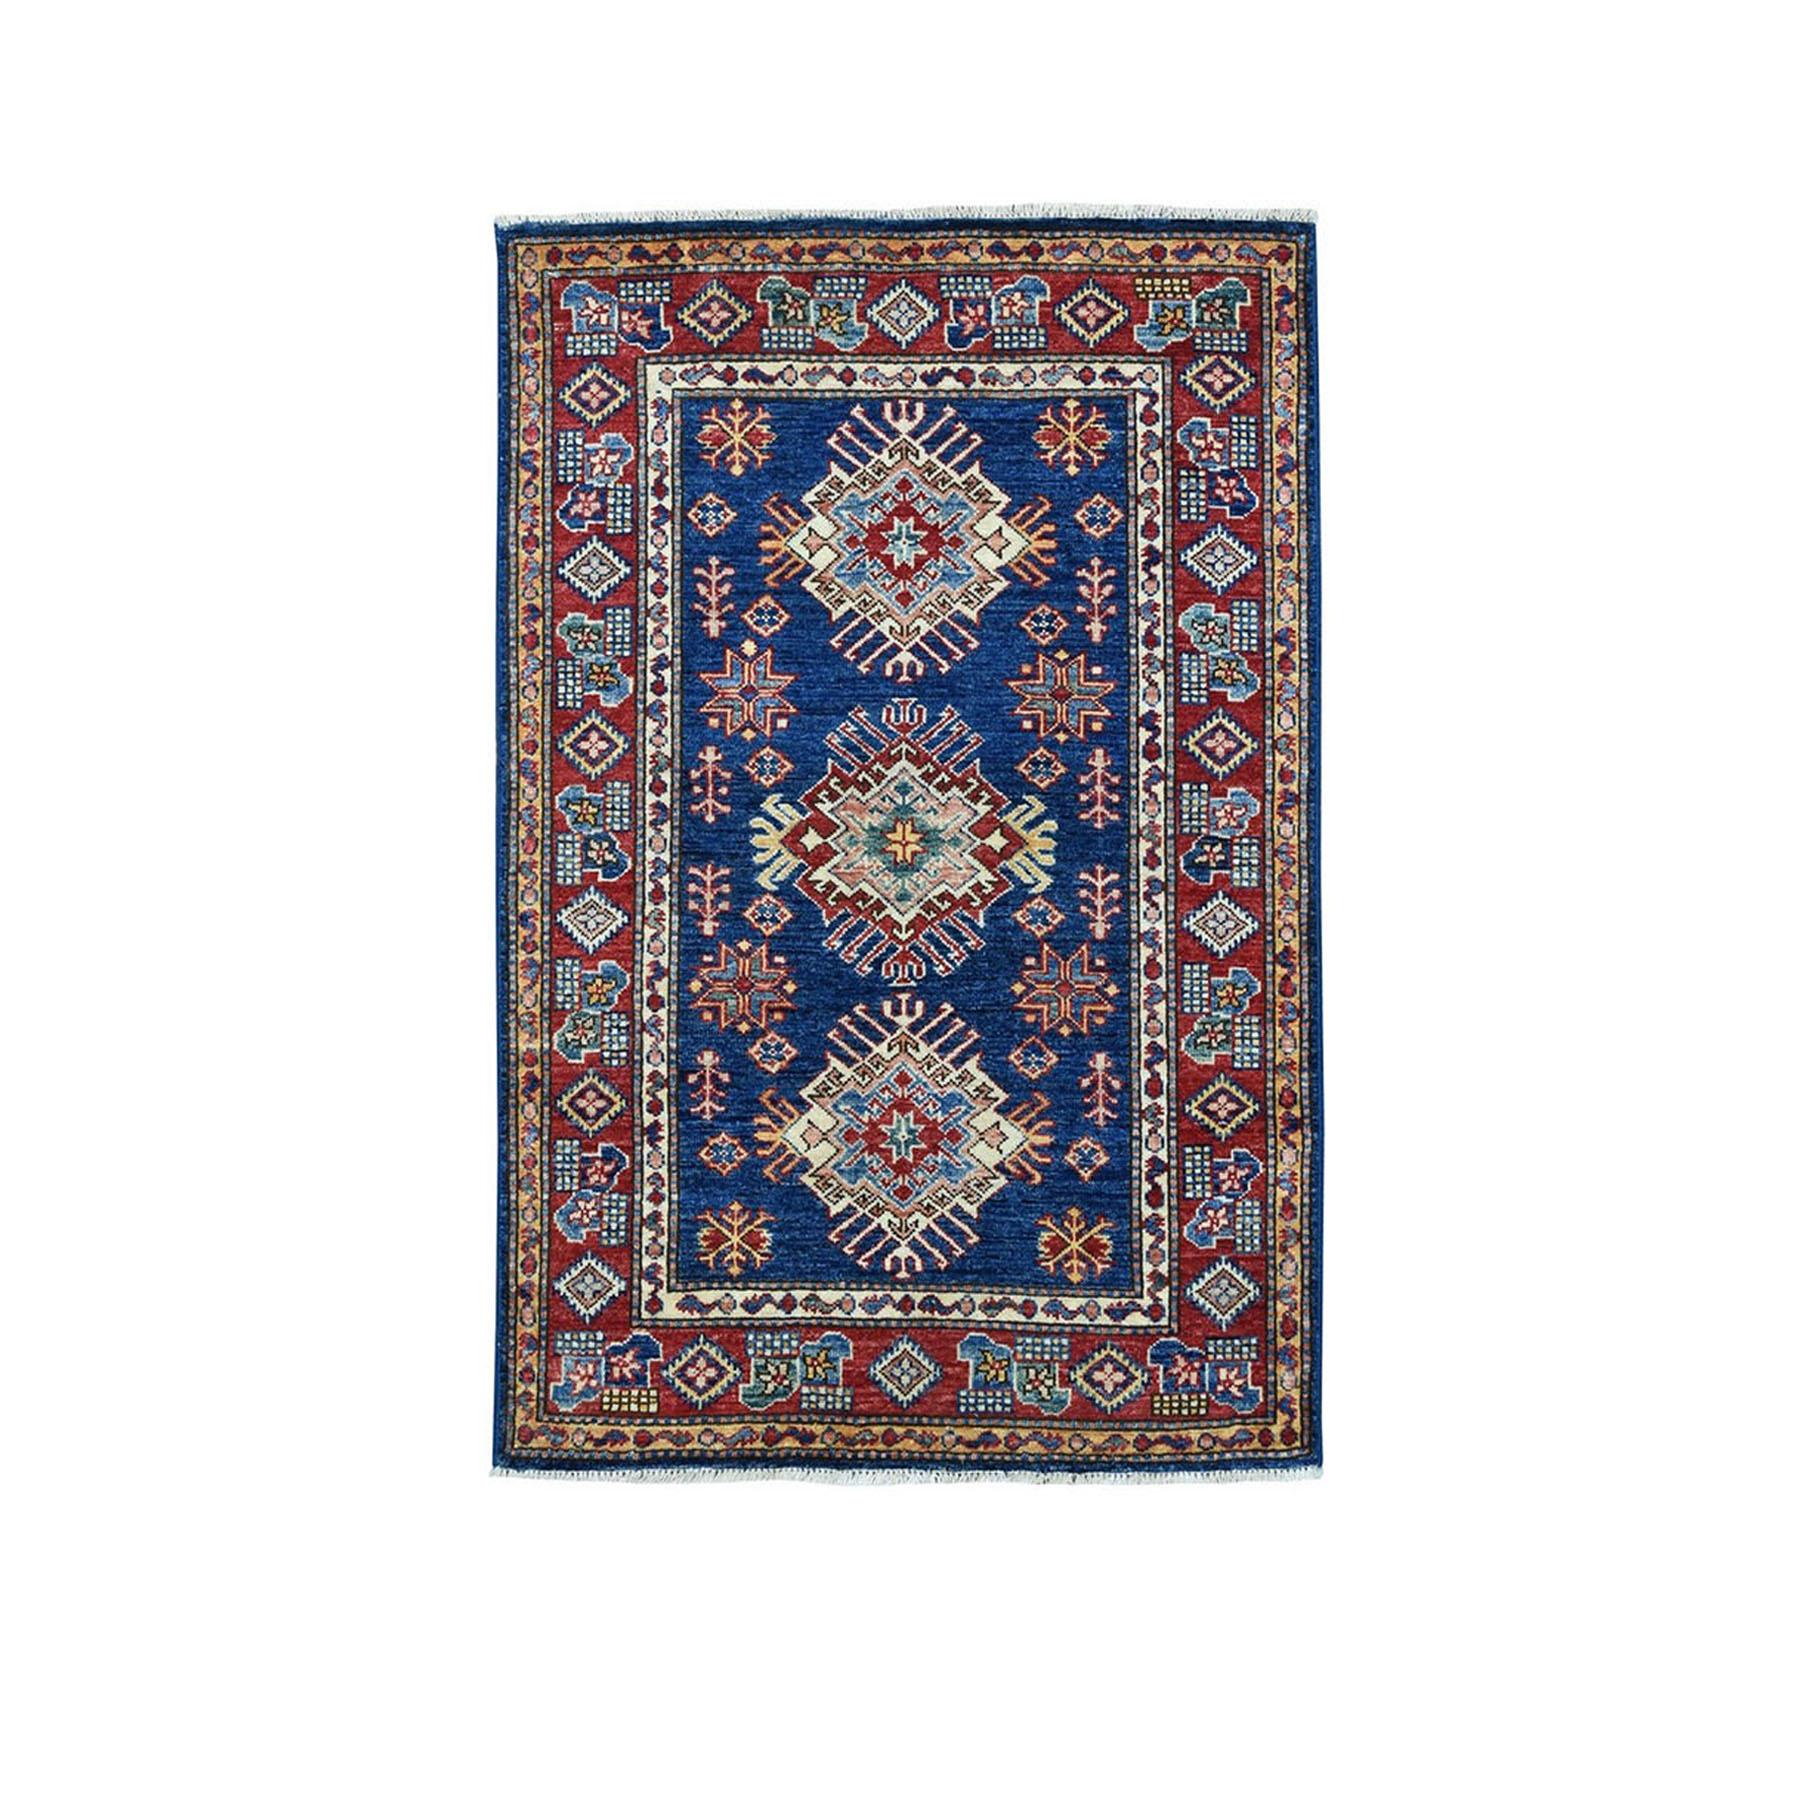 3'X4' Blue Super Kazak Geometric Design Pure Wool Hand-Knotted Oriental Rug moae0979